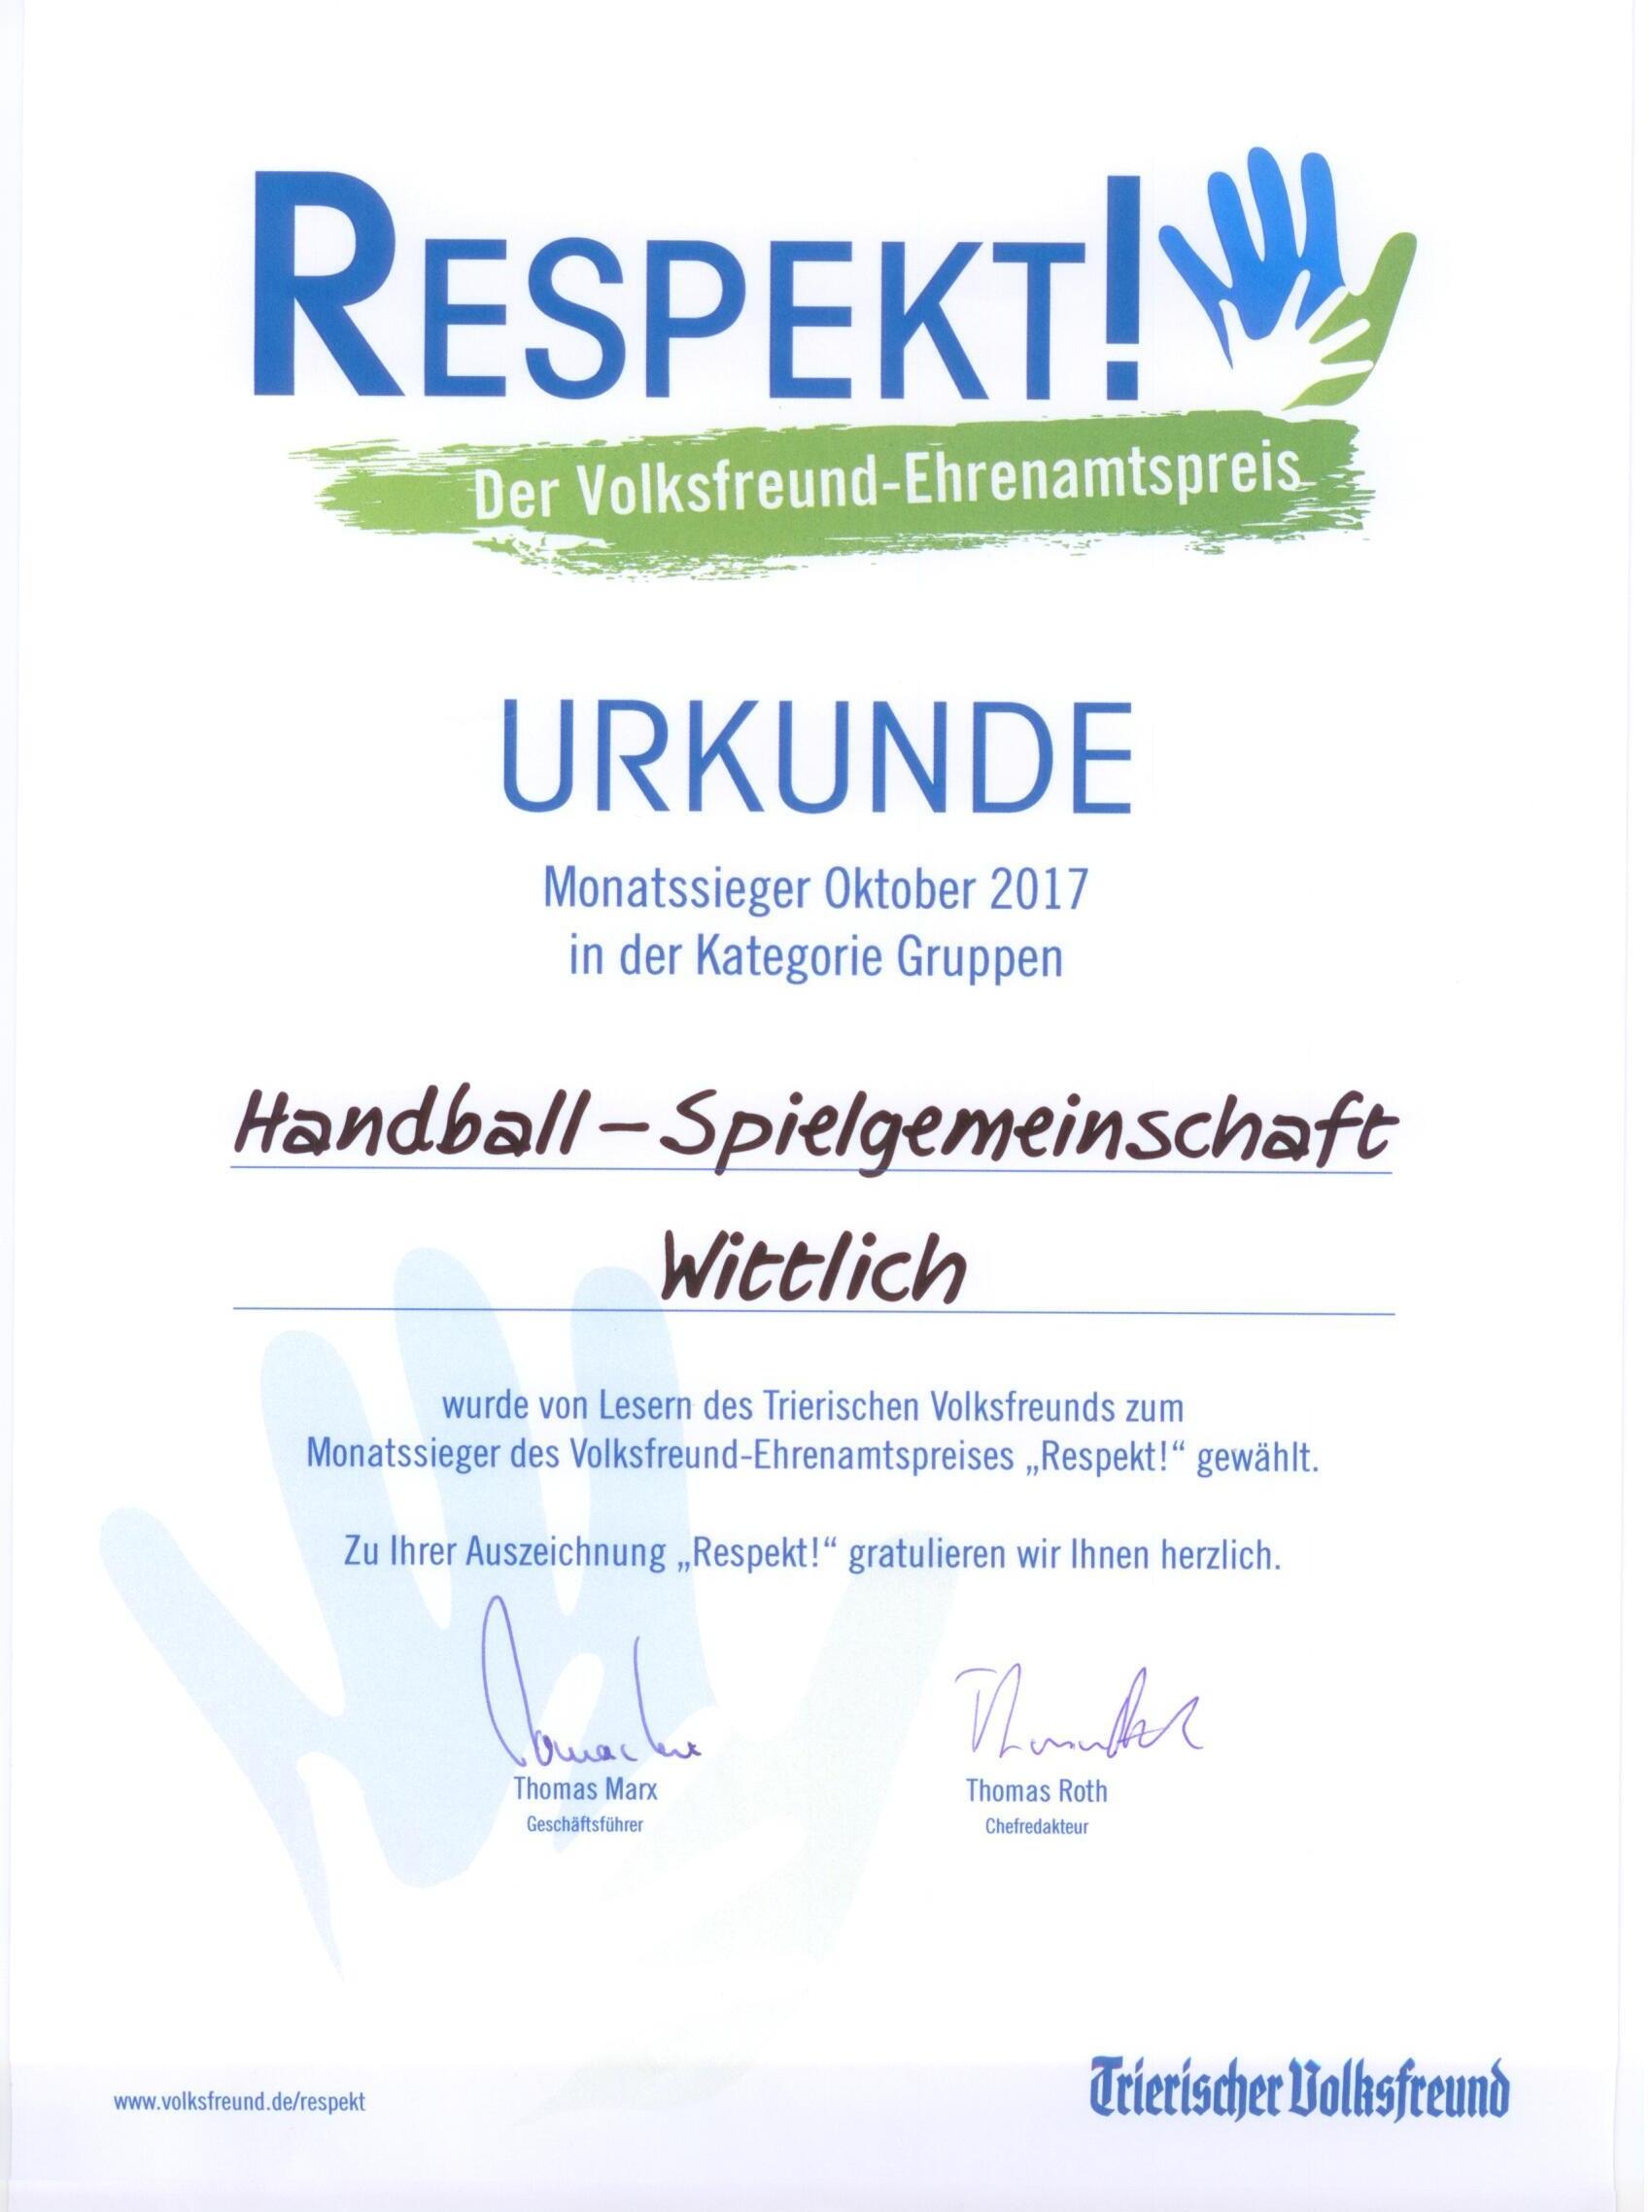 TV-Respekt-Urkunde-01